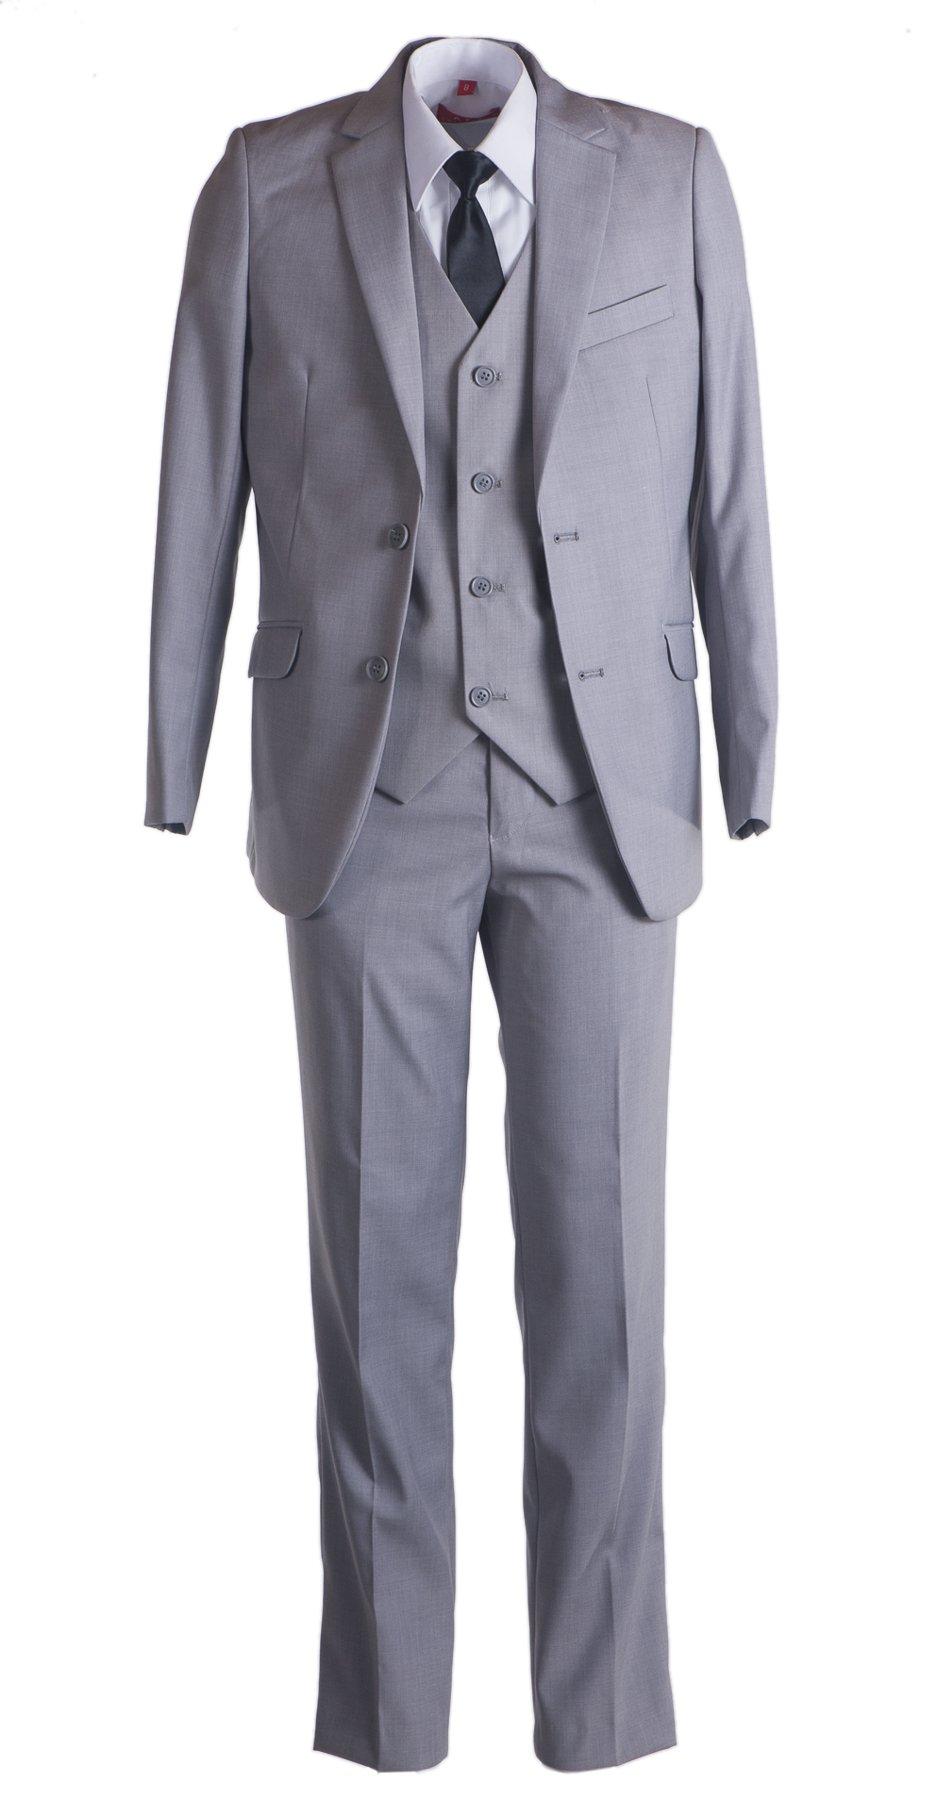 Tuxgear Boys Slim Fit Suit Light Grey with Black Dress Tie (8)